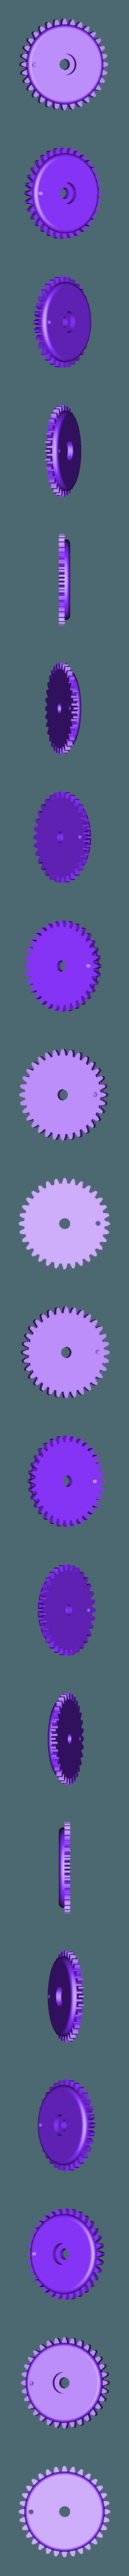 Wheel_Geared_64_teeth.stl Download free STL file Marblevator, Mechanisms • Object to 3D print, gzumwalt